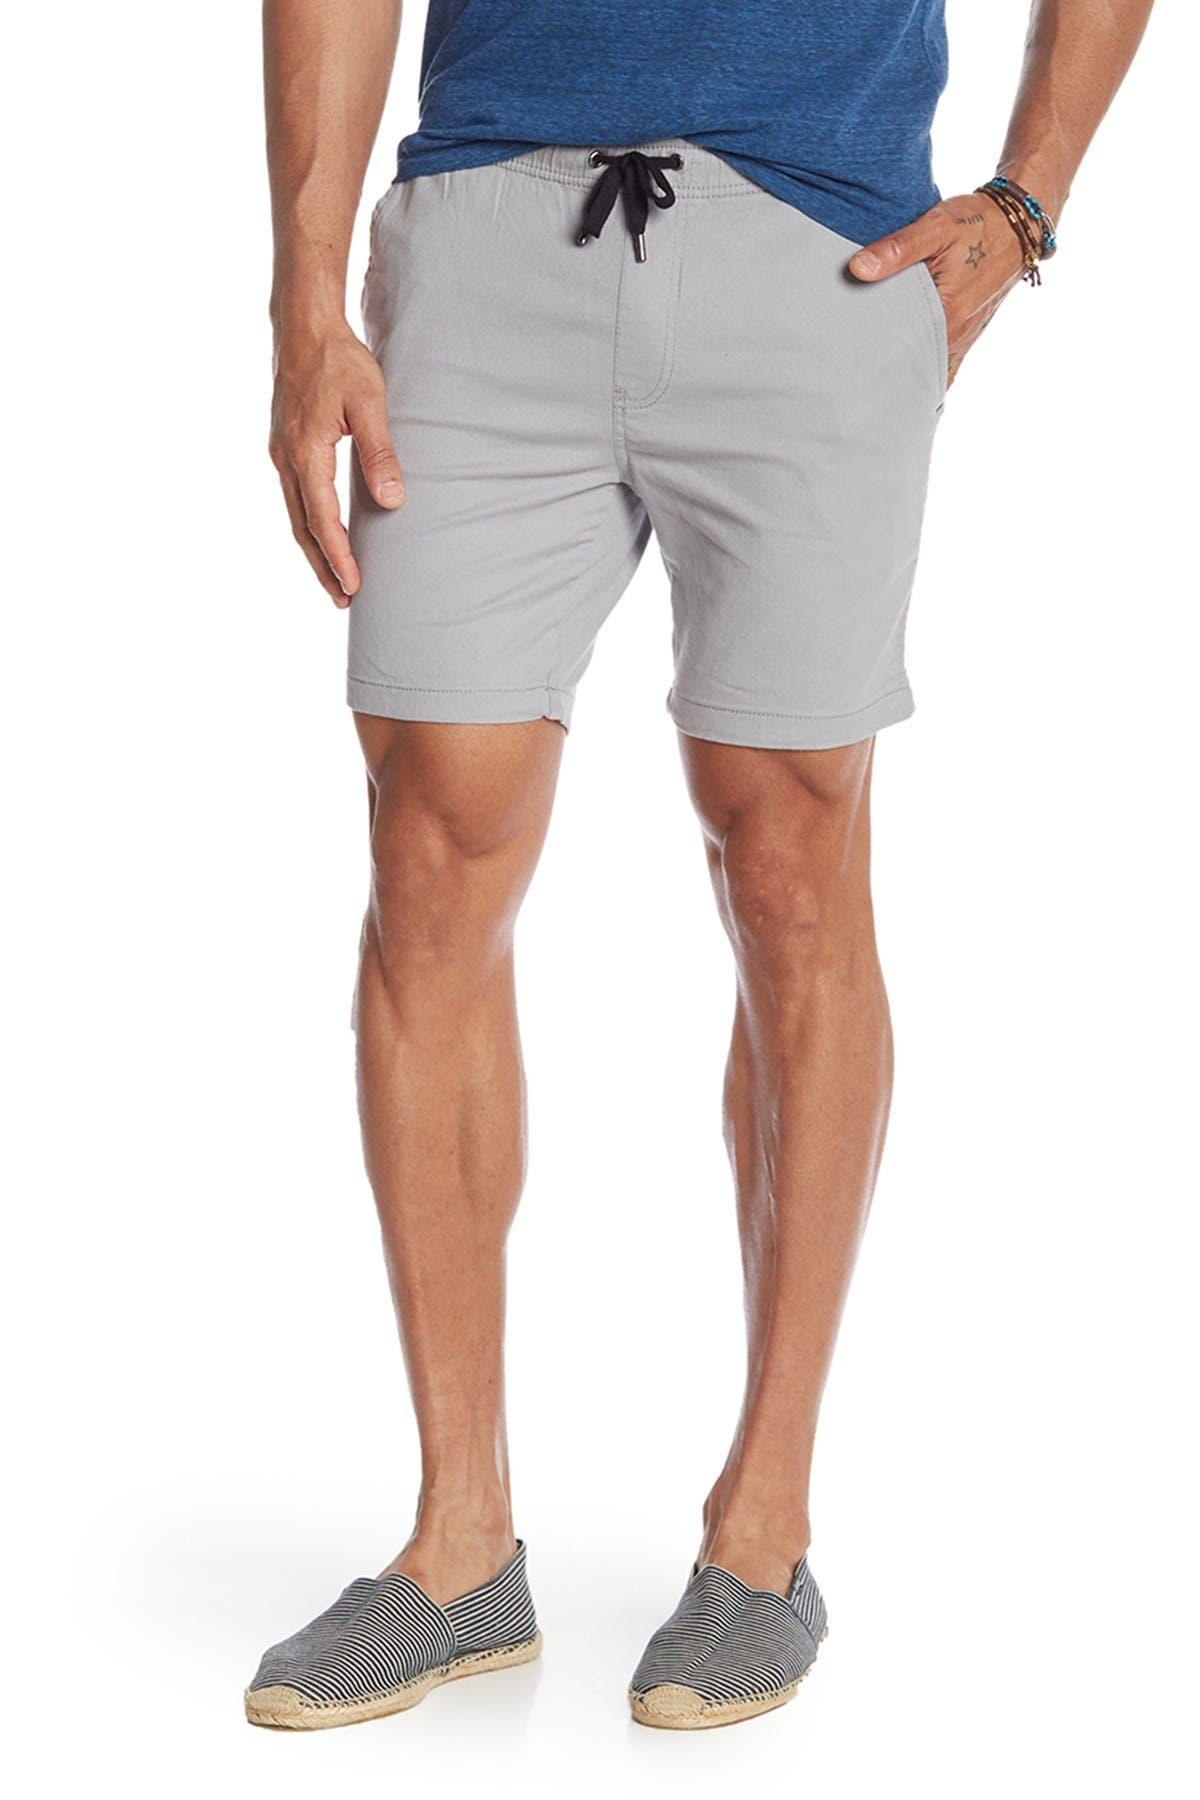 Image of Mr. Swim Elastic Chino Shorts